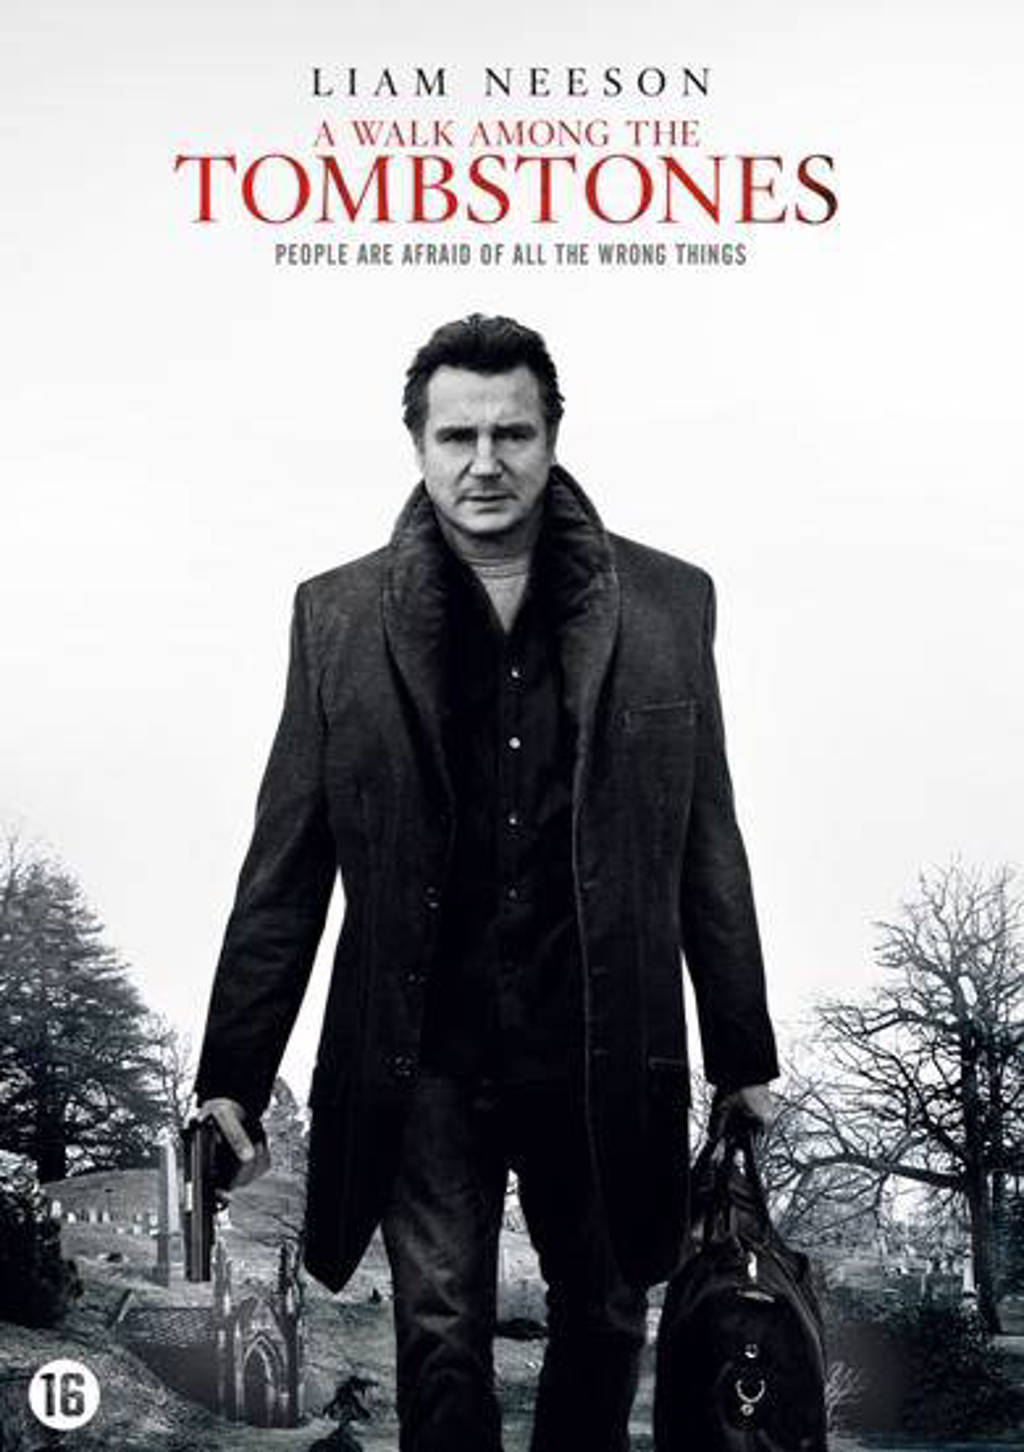 Walk among the tombstones (DVD)